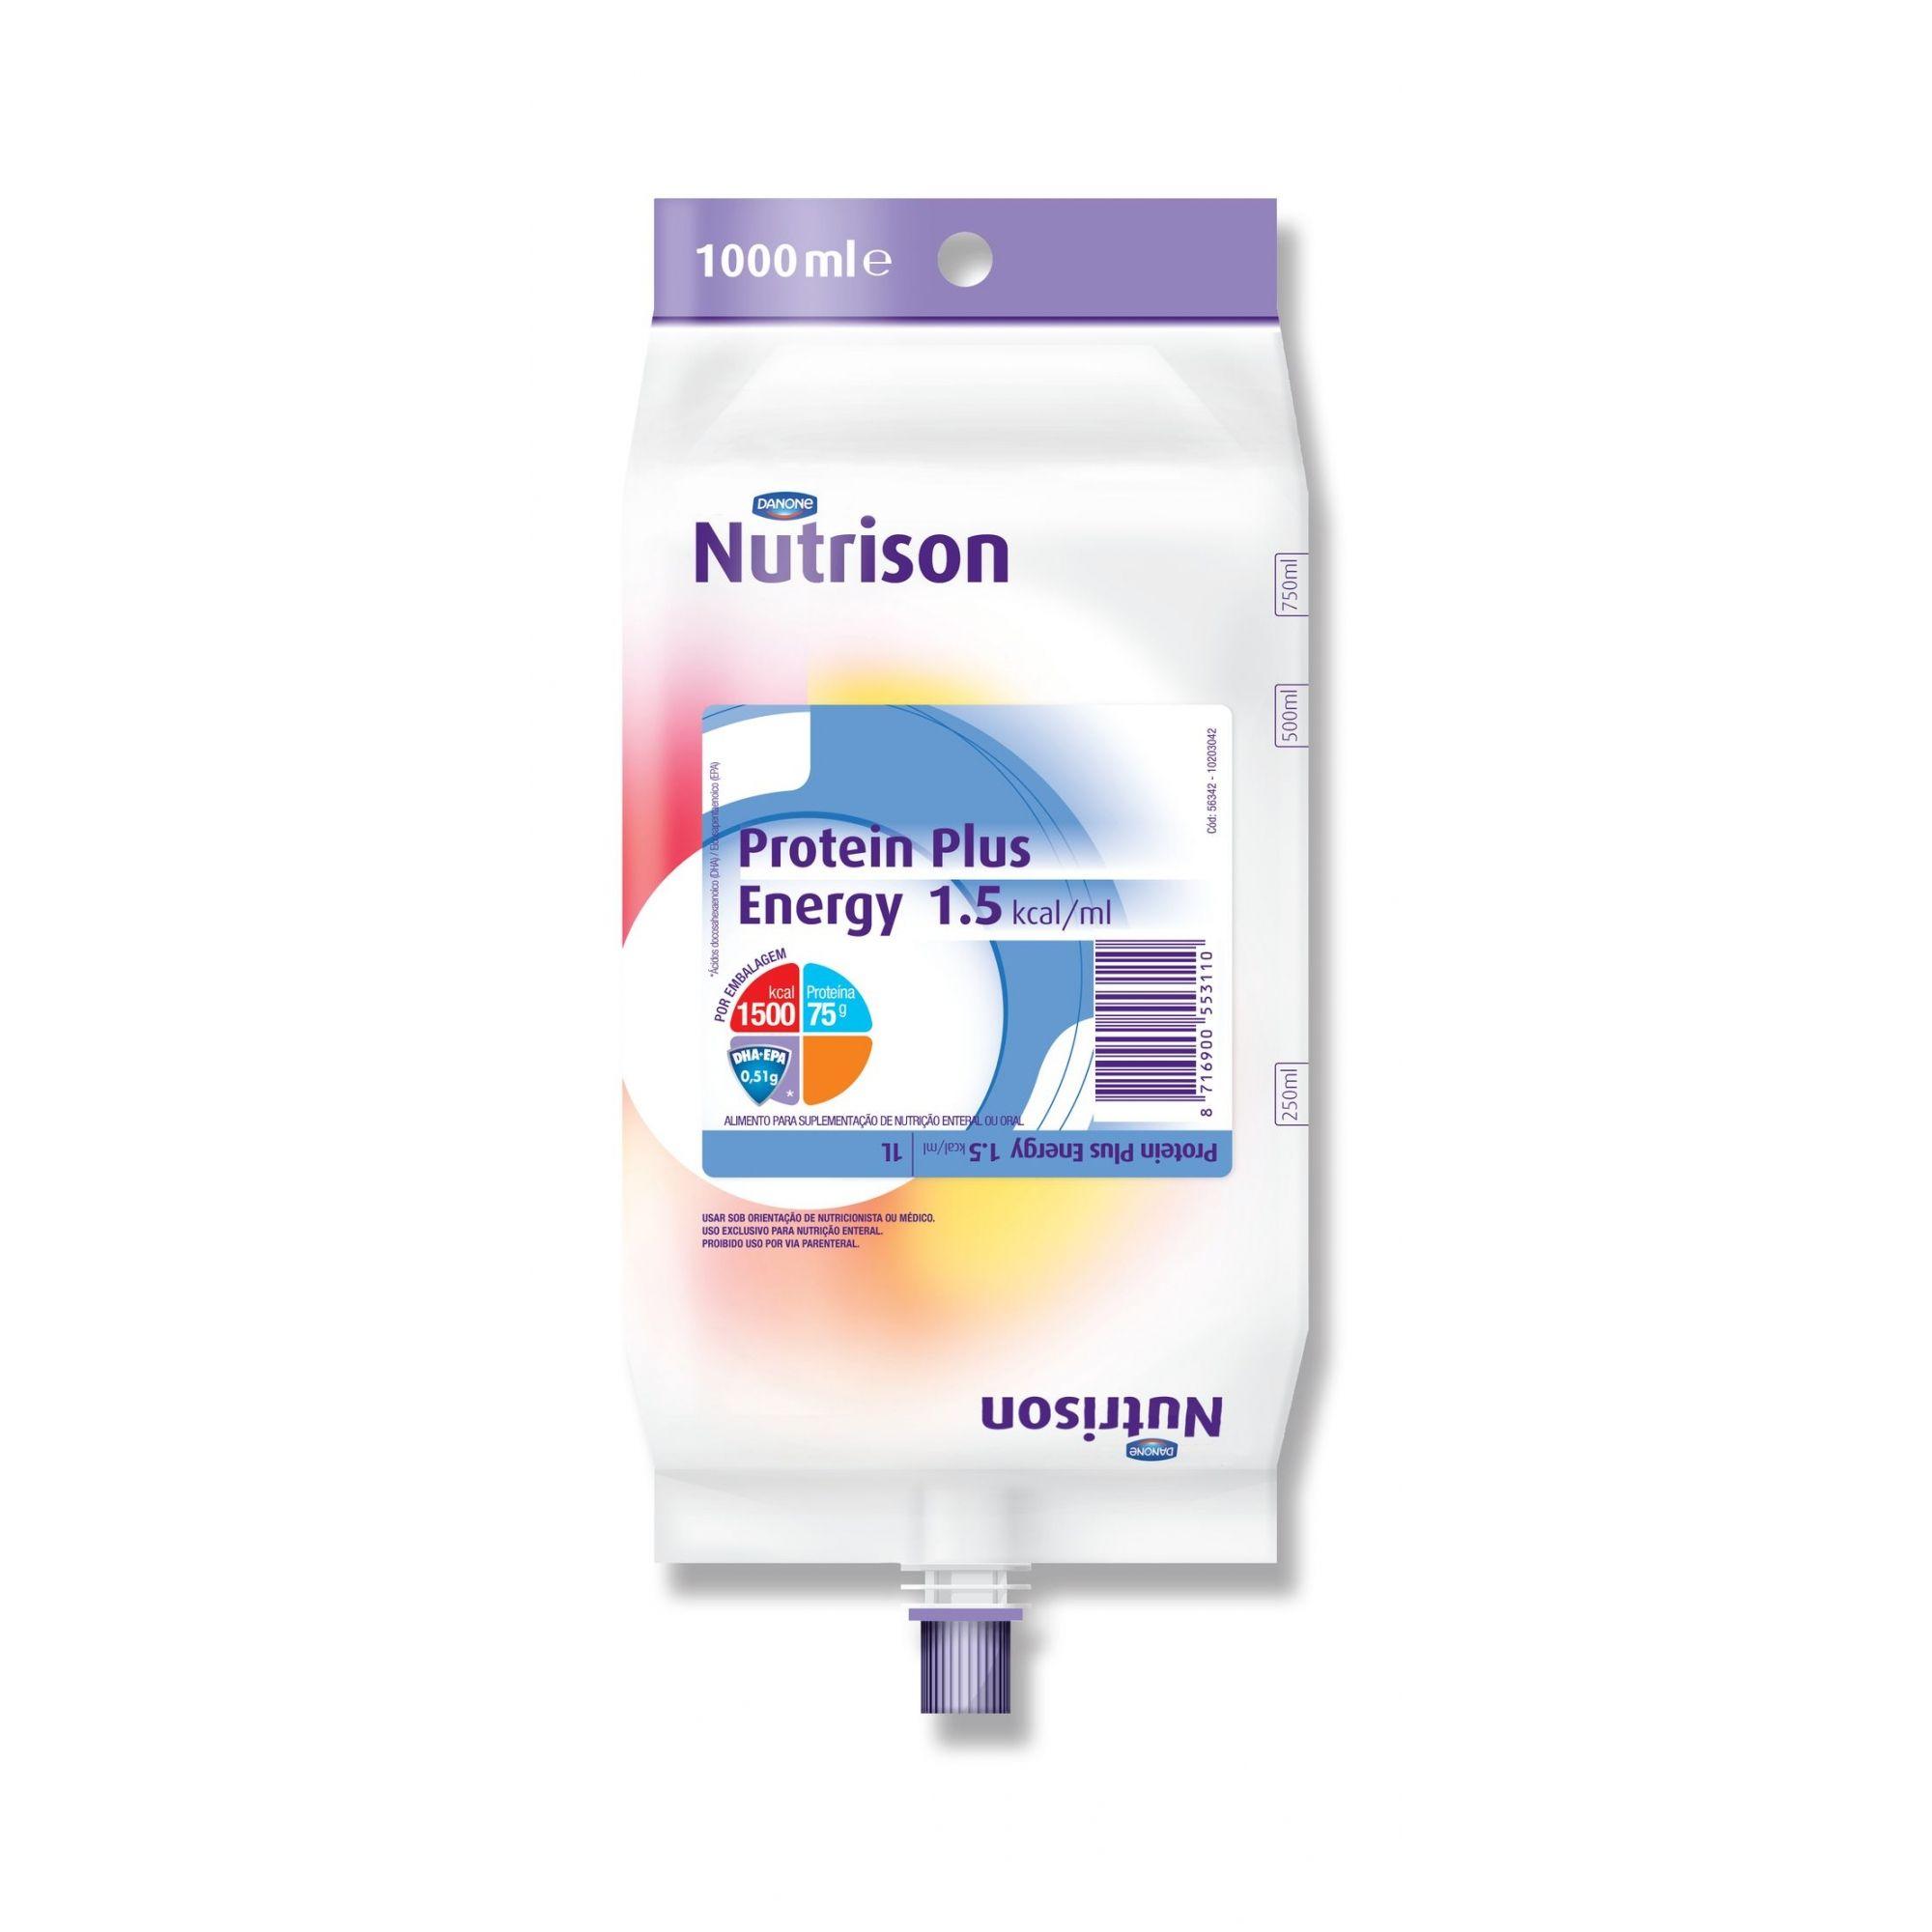 Nutrison Protein Plus Energy 1L pack - (Danone)